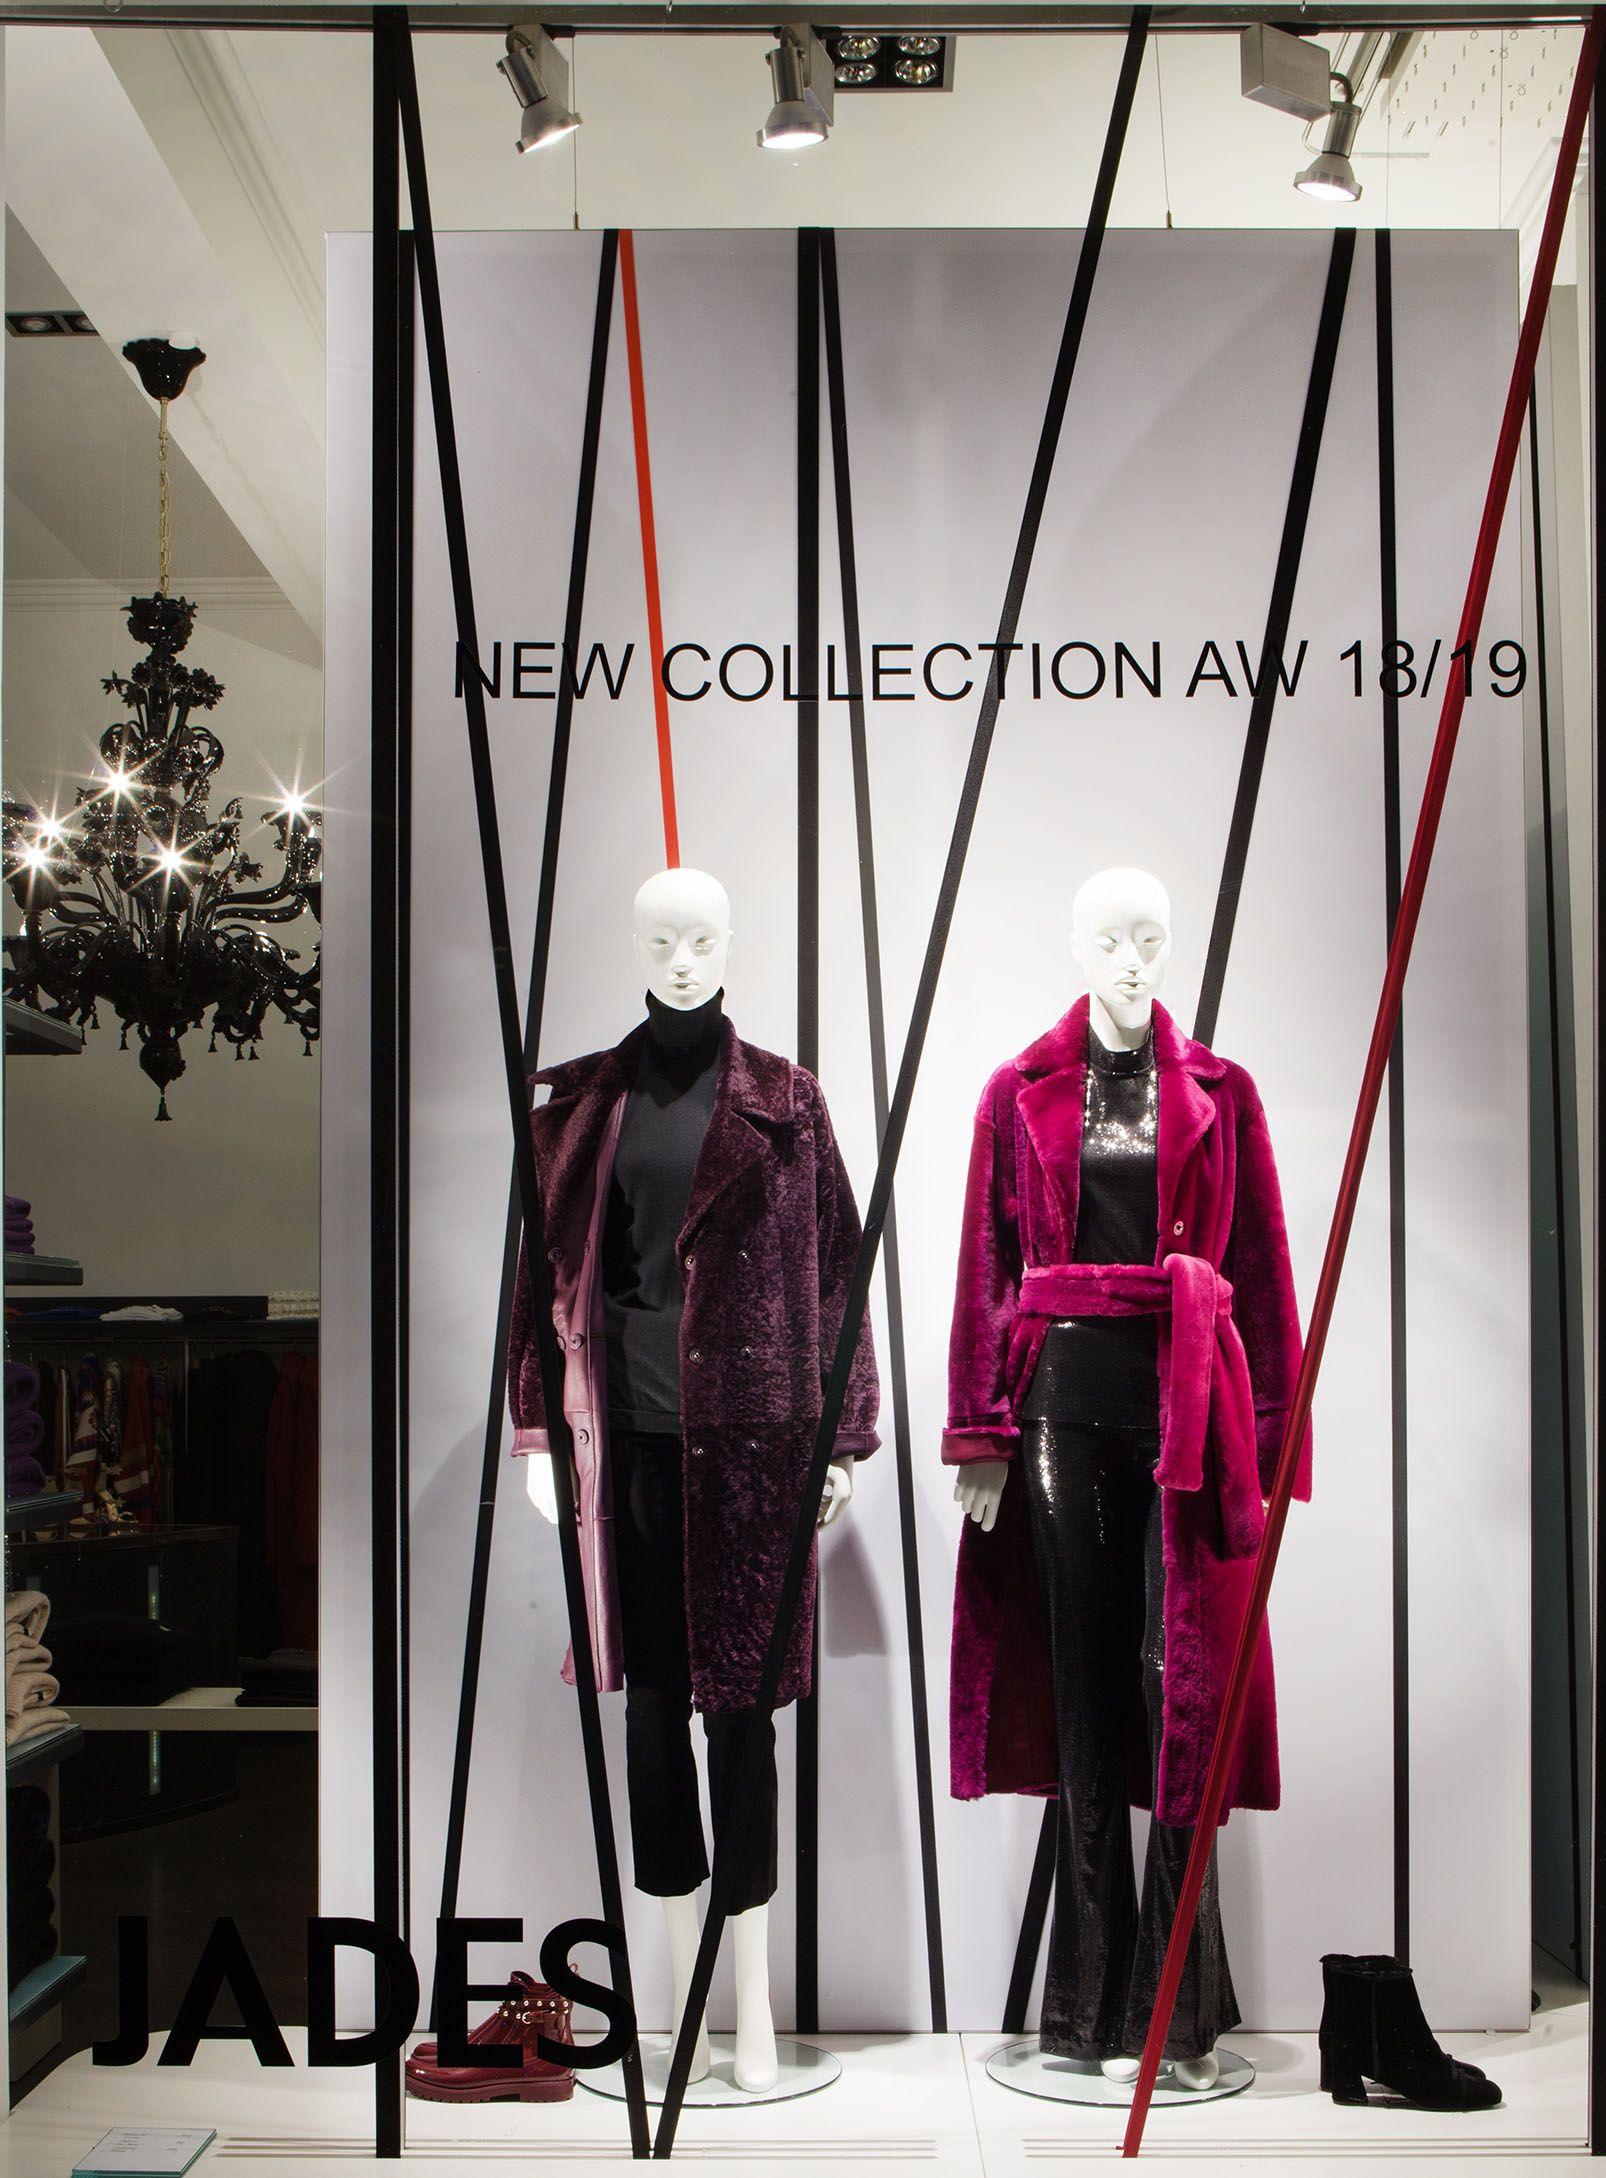 Fashion Stars Stripes Aw18 19 Windows At Jades In Duesseldorf Credits Store Jades Duesseldorf Www Jades24 Com C Fashion Fall Shopping Star Fashion